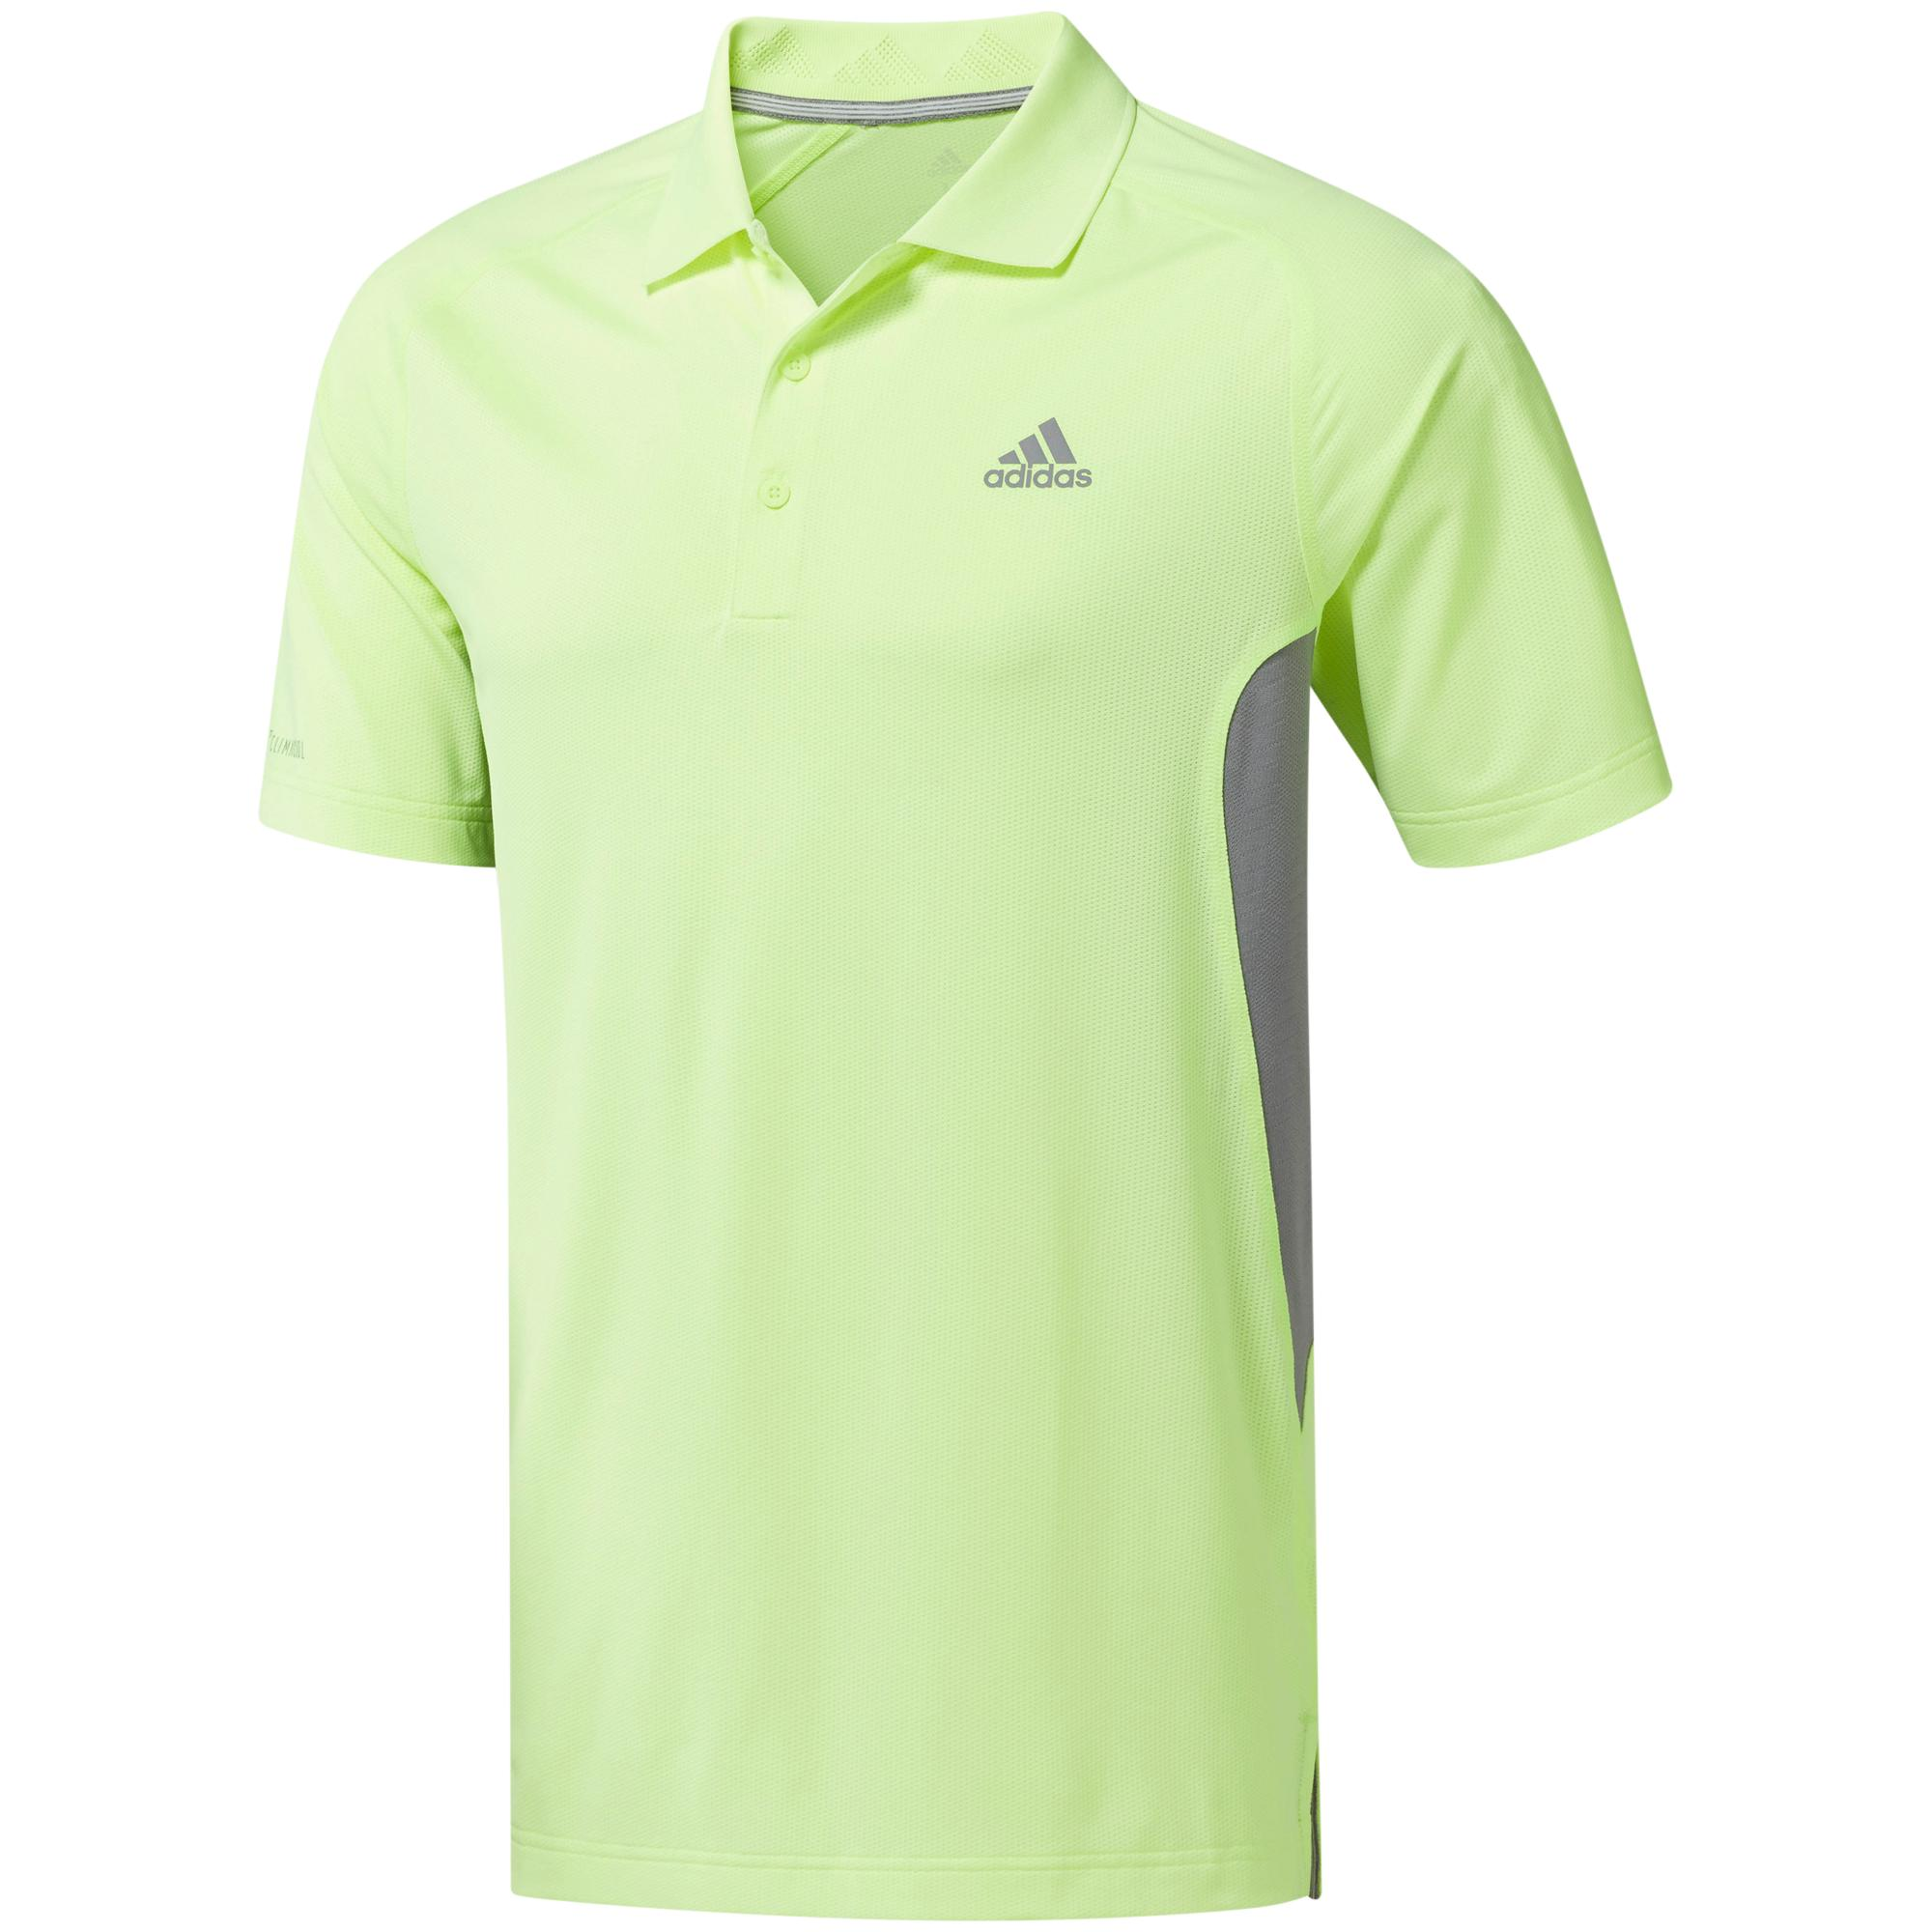 Men's Ultimate 365 Climacool Solid Short Sleeve Shirt